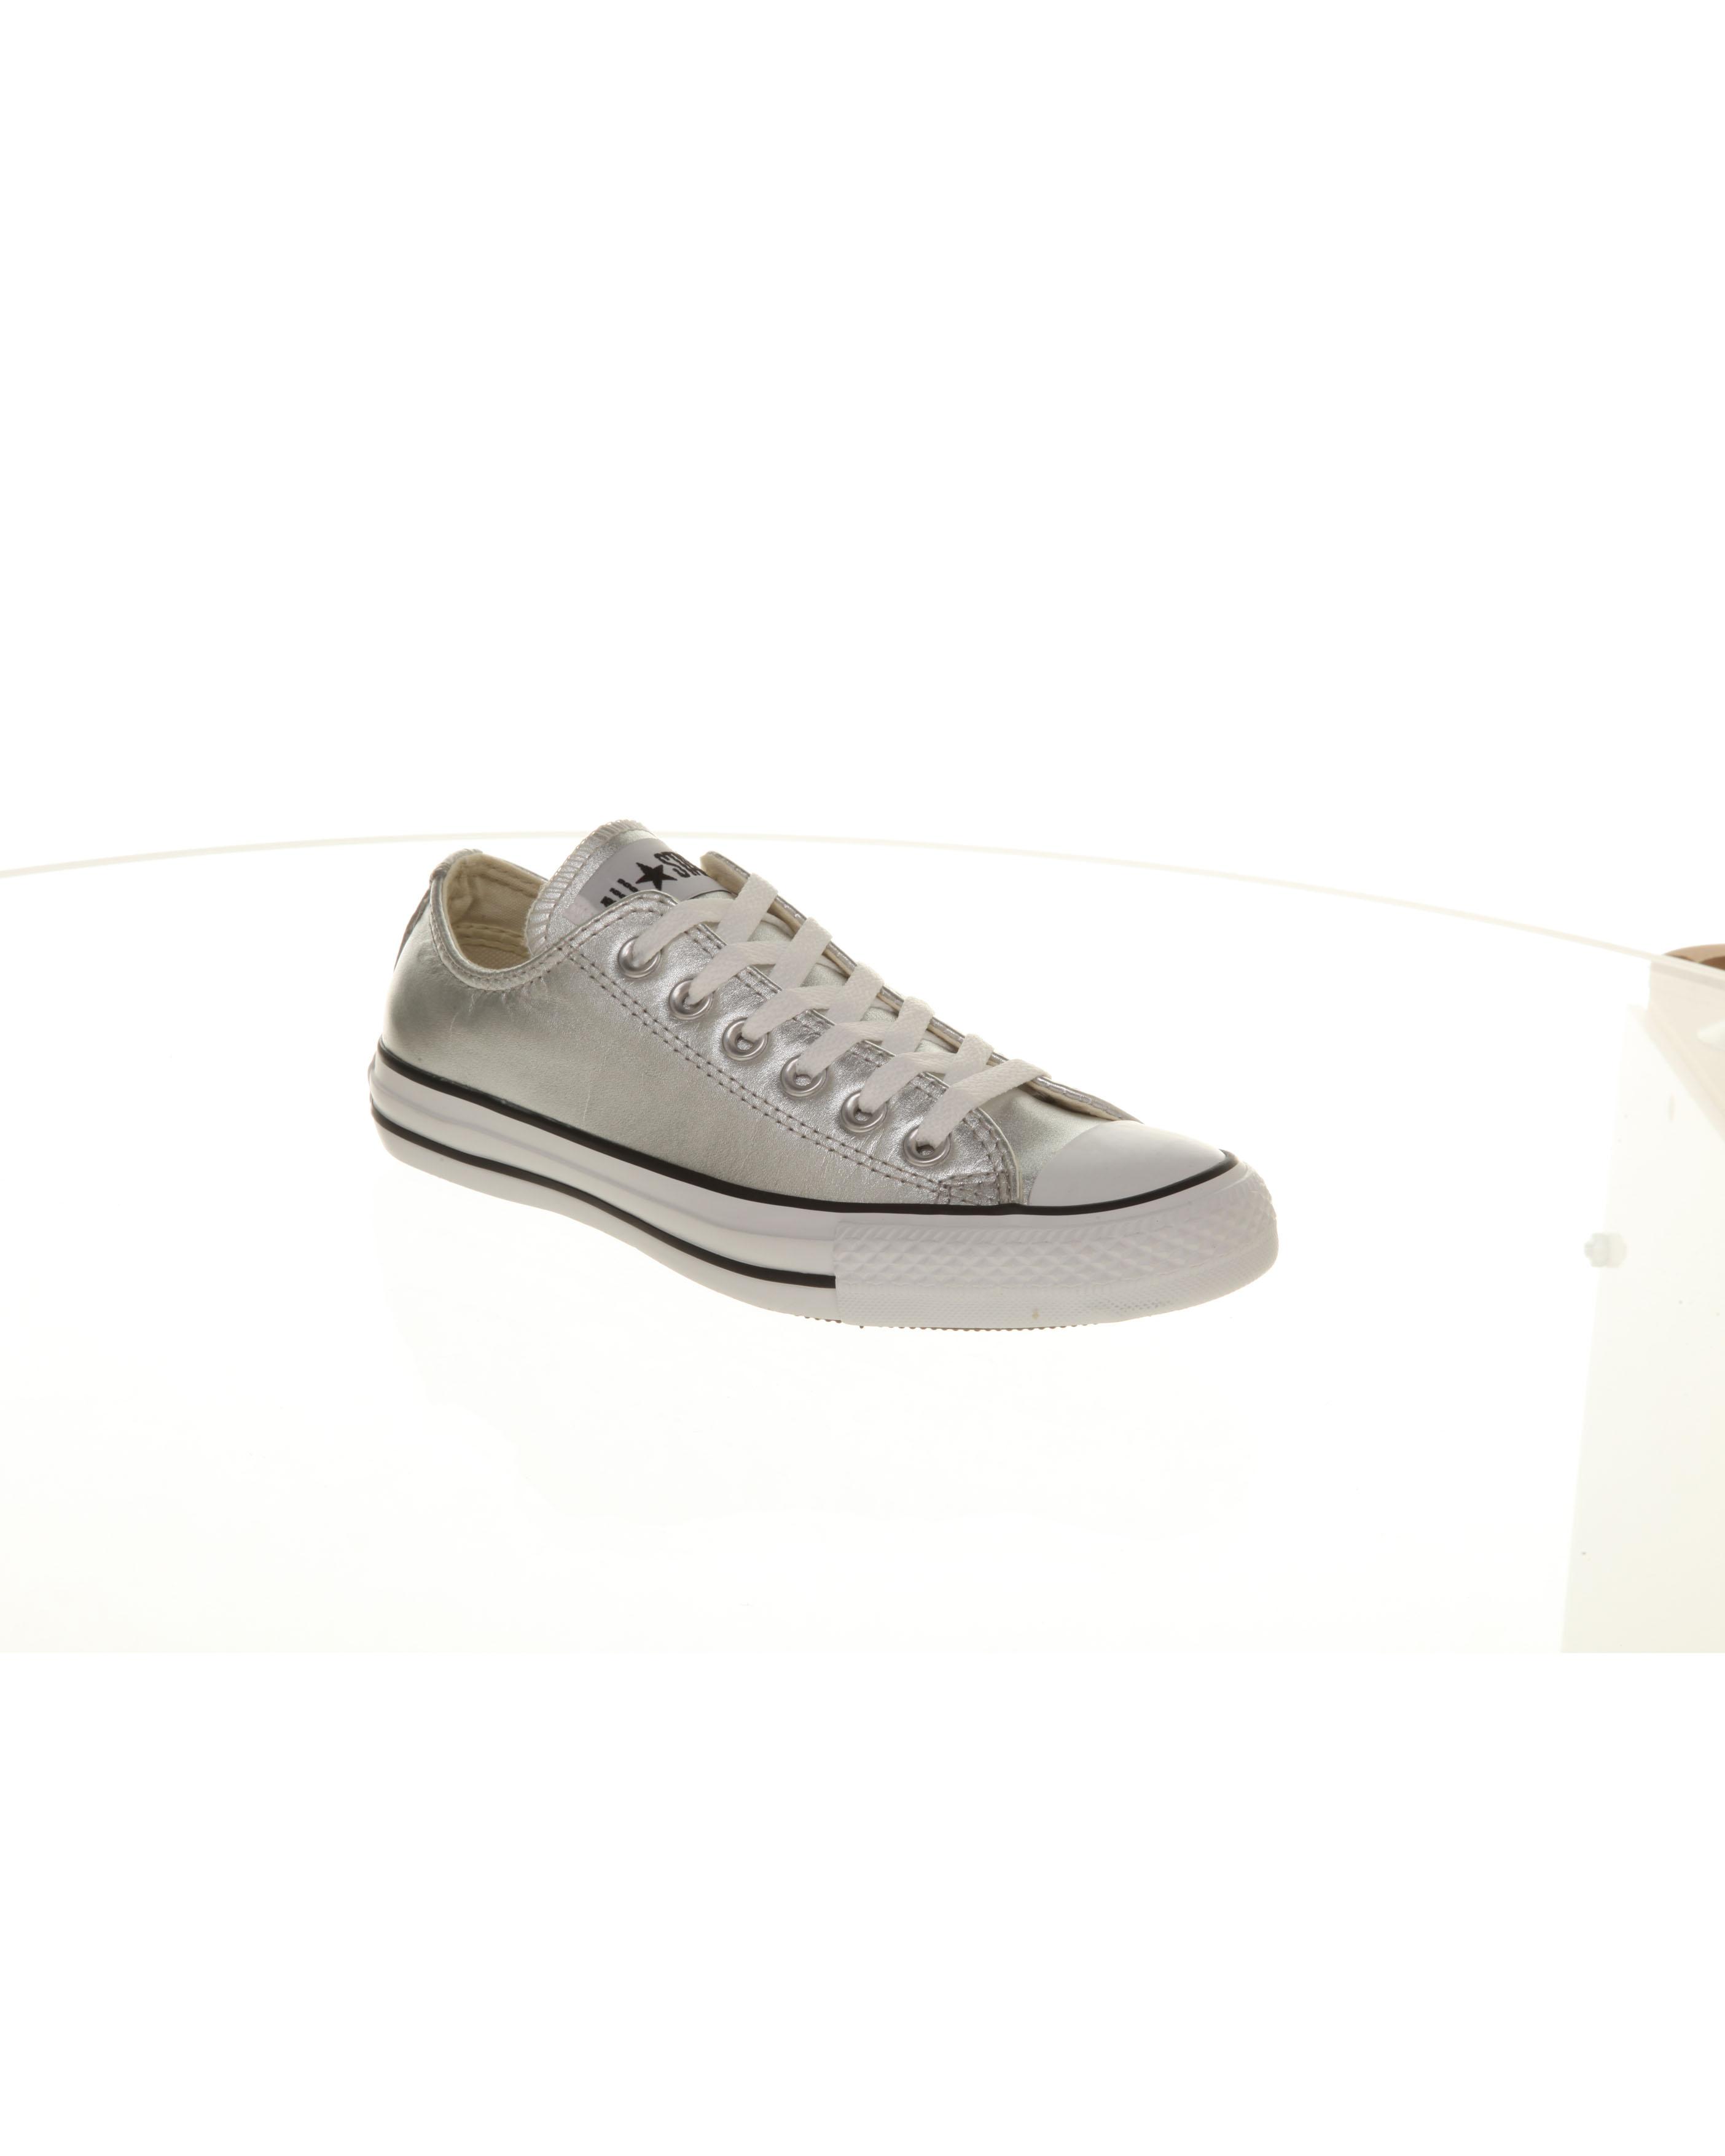 7da79997c7e3 Image is loading Converse-All-Star-Leather-Ox-Low-Silver-Metallic-